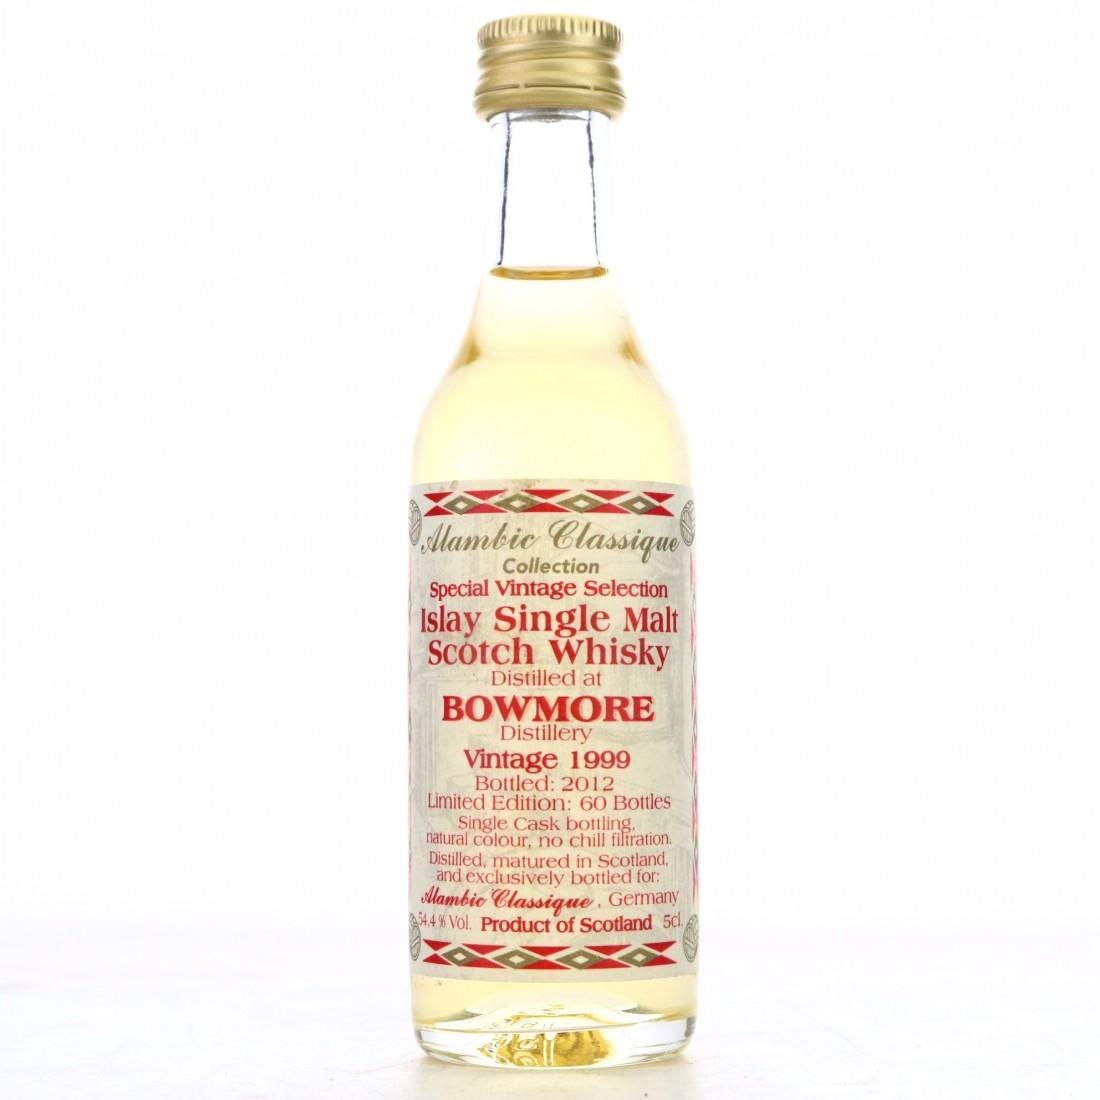 Bowmore 1999 Alambic Classique Miniature